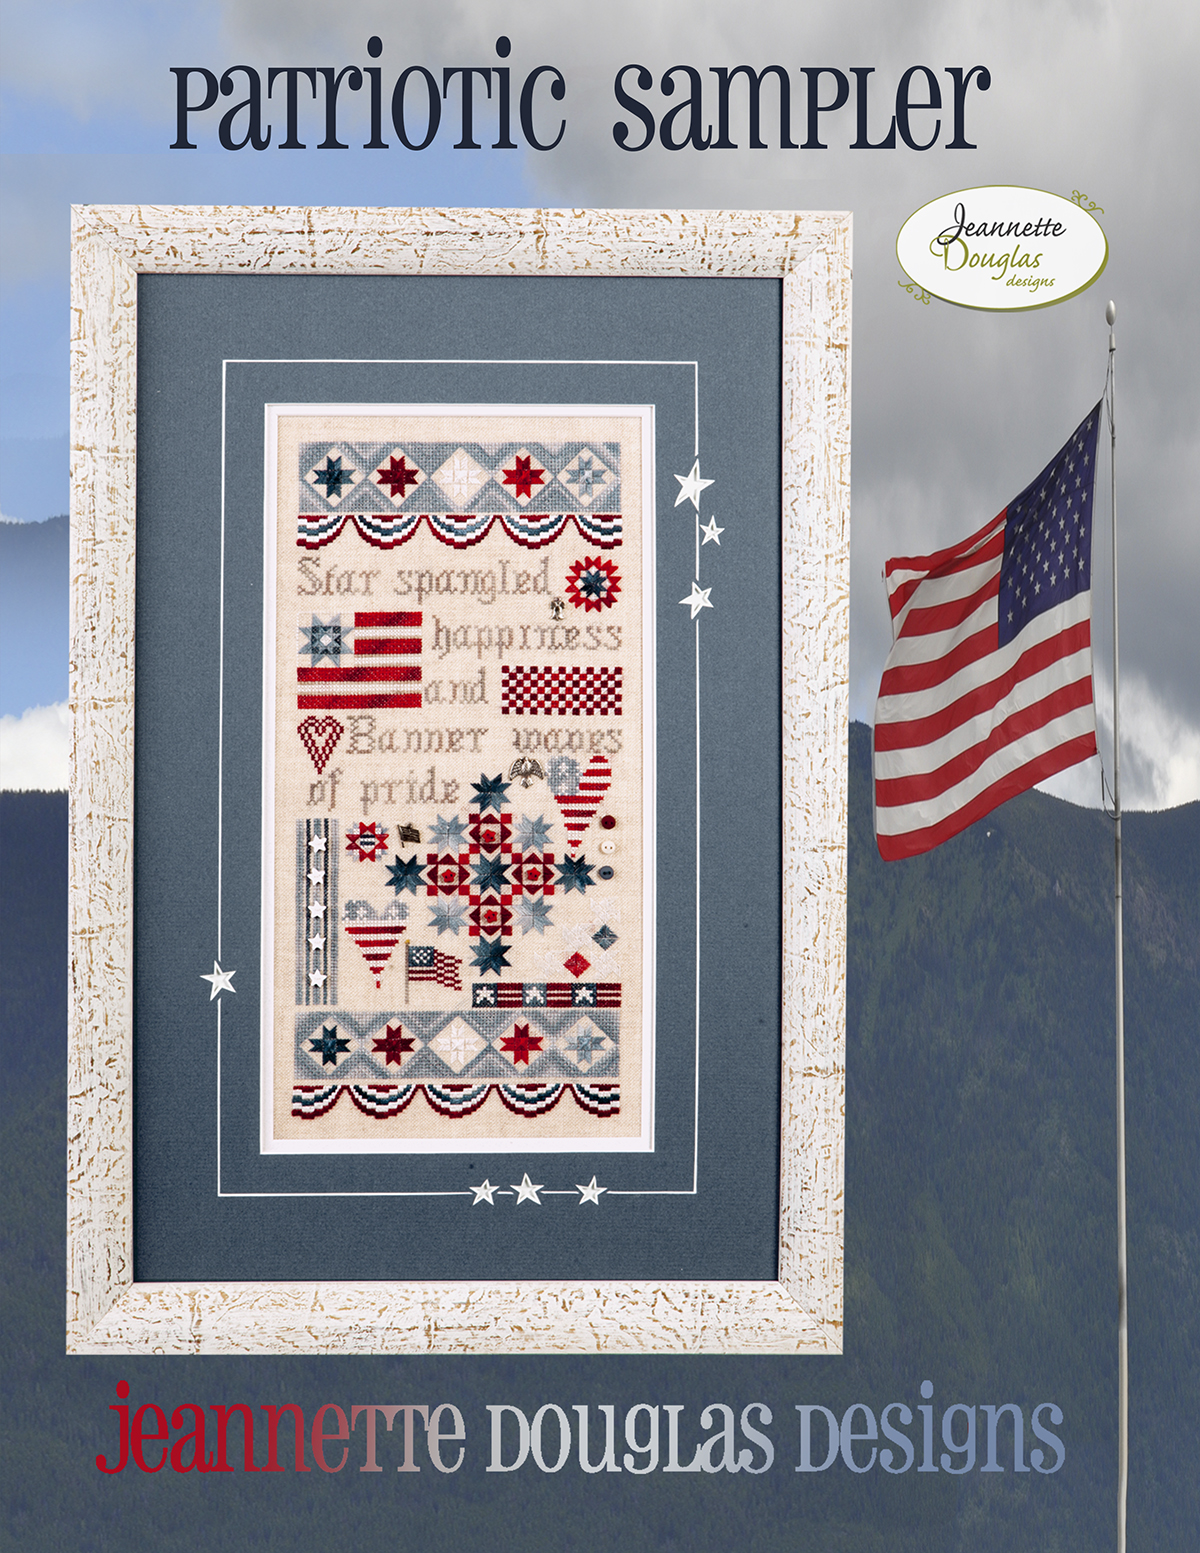 Patriotic Sampler